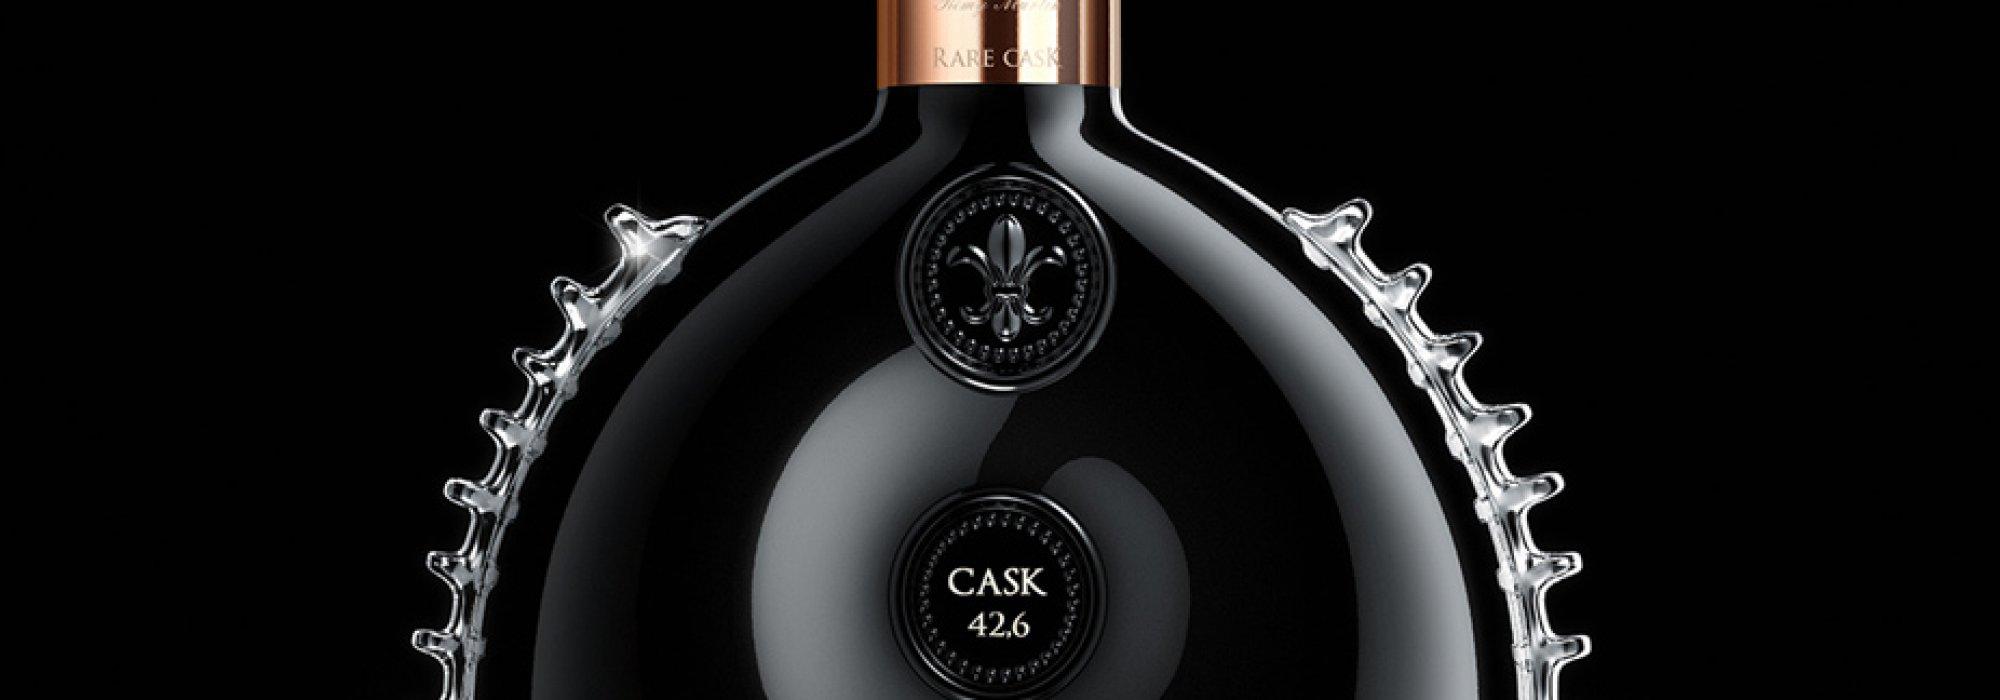 Louis XIII - Cognac Rémy Martin